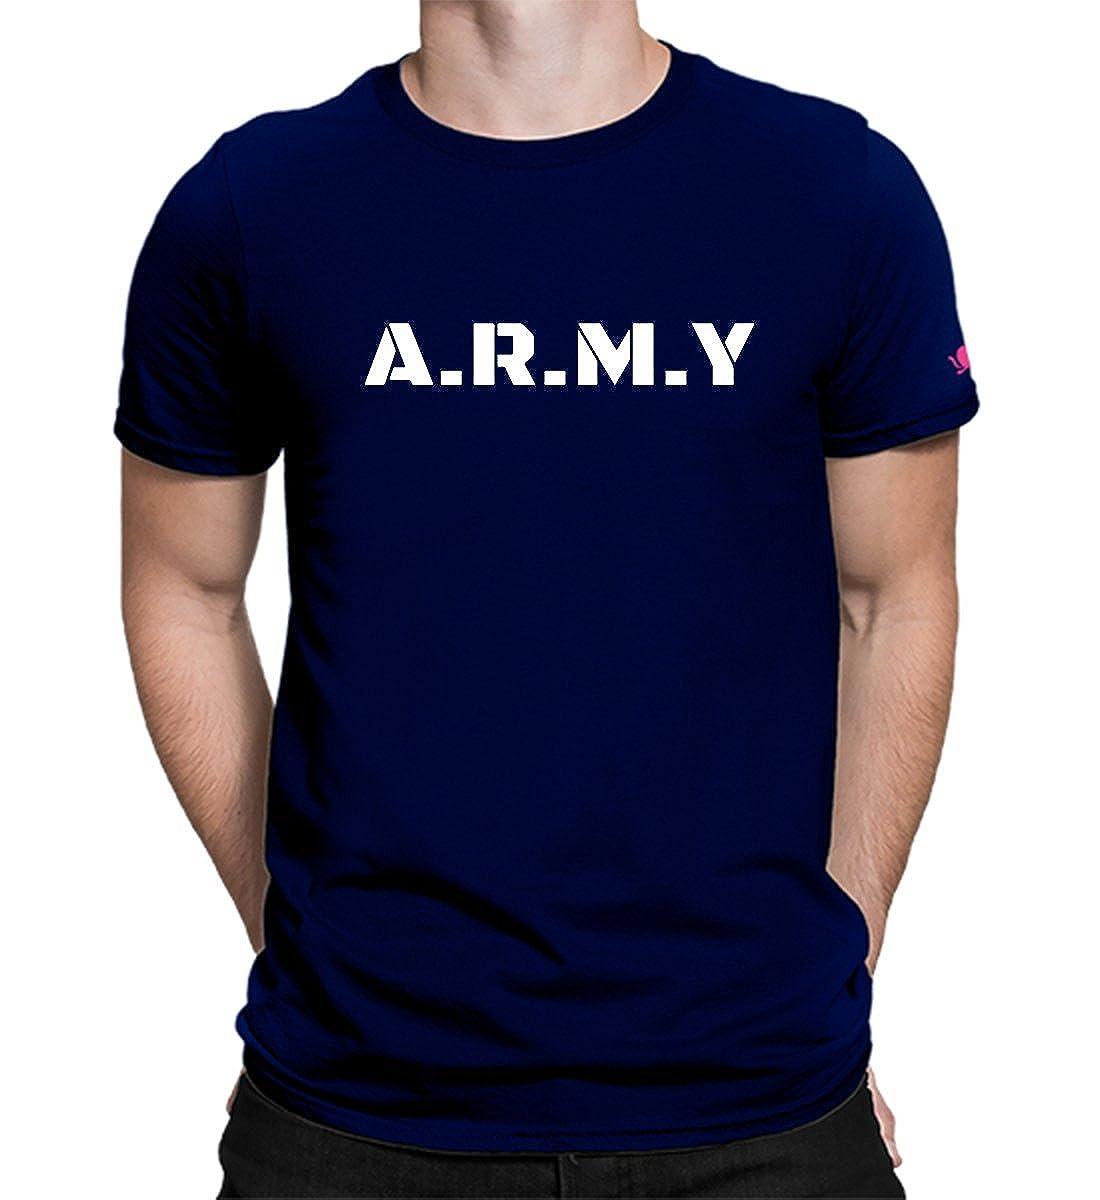 33279b38 Graphic Printed T-Shirt for Men & Women | Army Tshirt | Half Sleeve T-Shirt  | Round Neck T Shirt | 100% Cotton T-Shirt | Short Sleeve T Shirt:  Amazon.in: ...